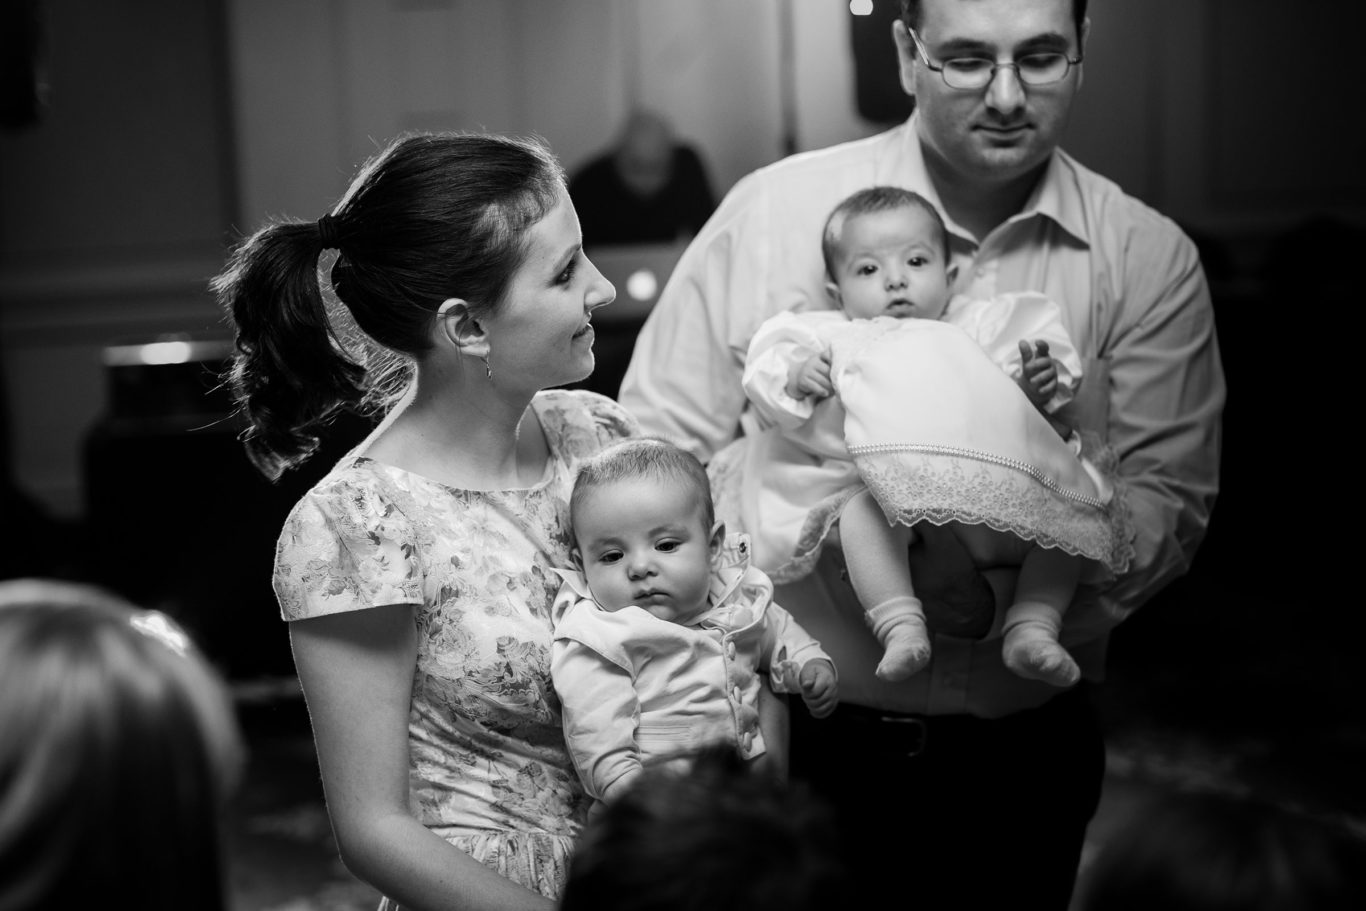 0367-Fotografii-botez-gemeni-Corina-Victor-fotograf-Ciprian-Dumitrescu-DC1X7530